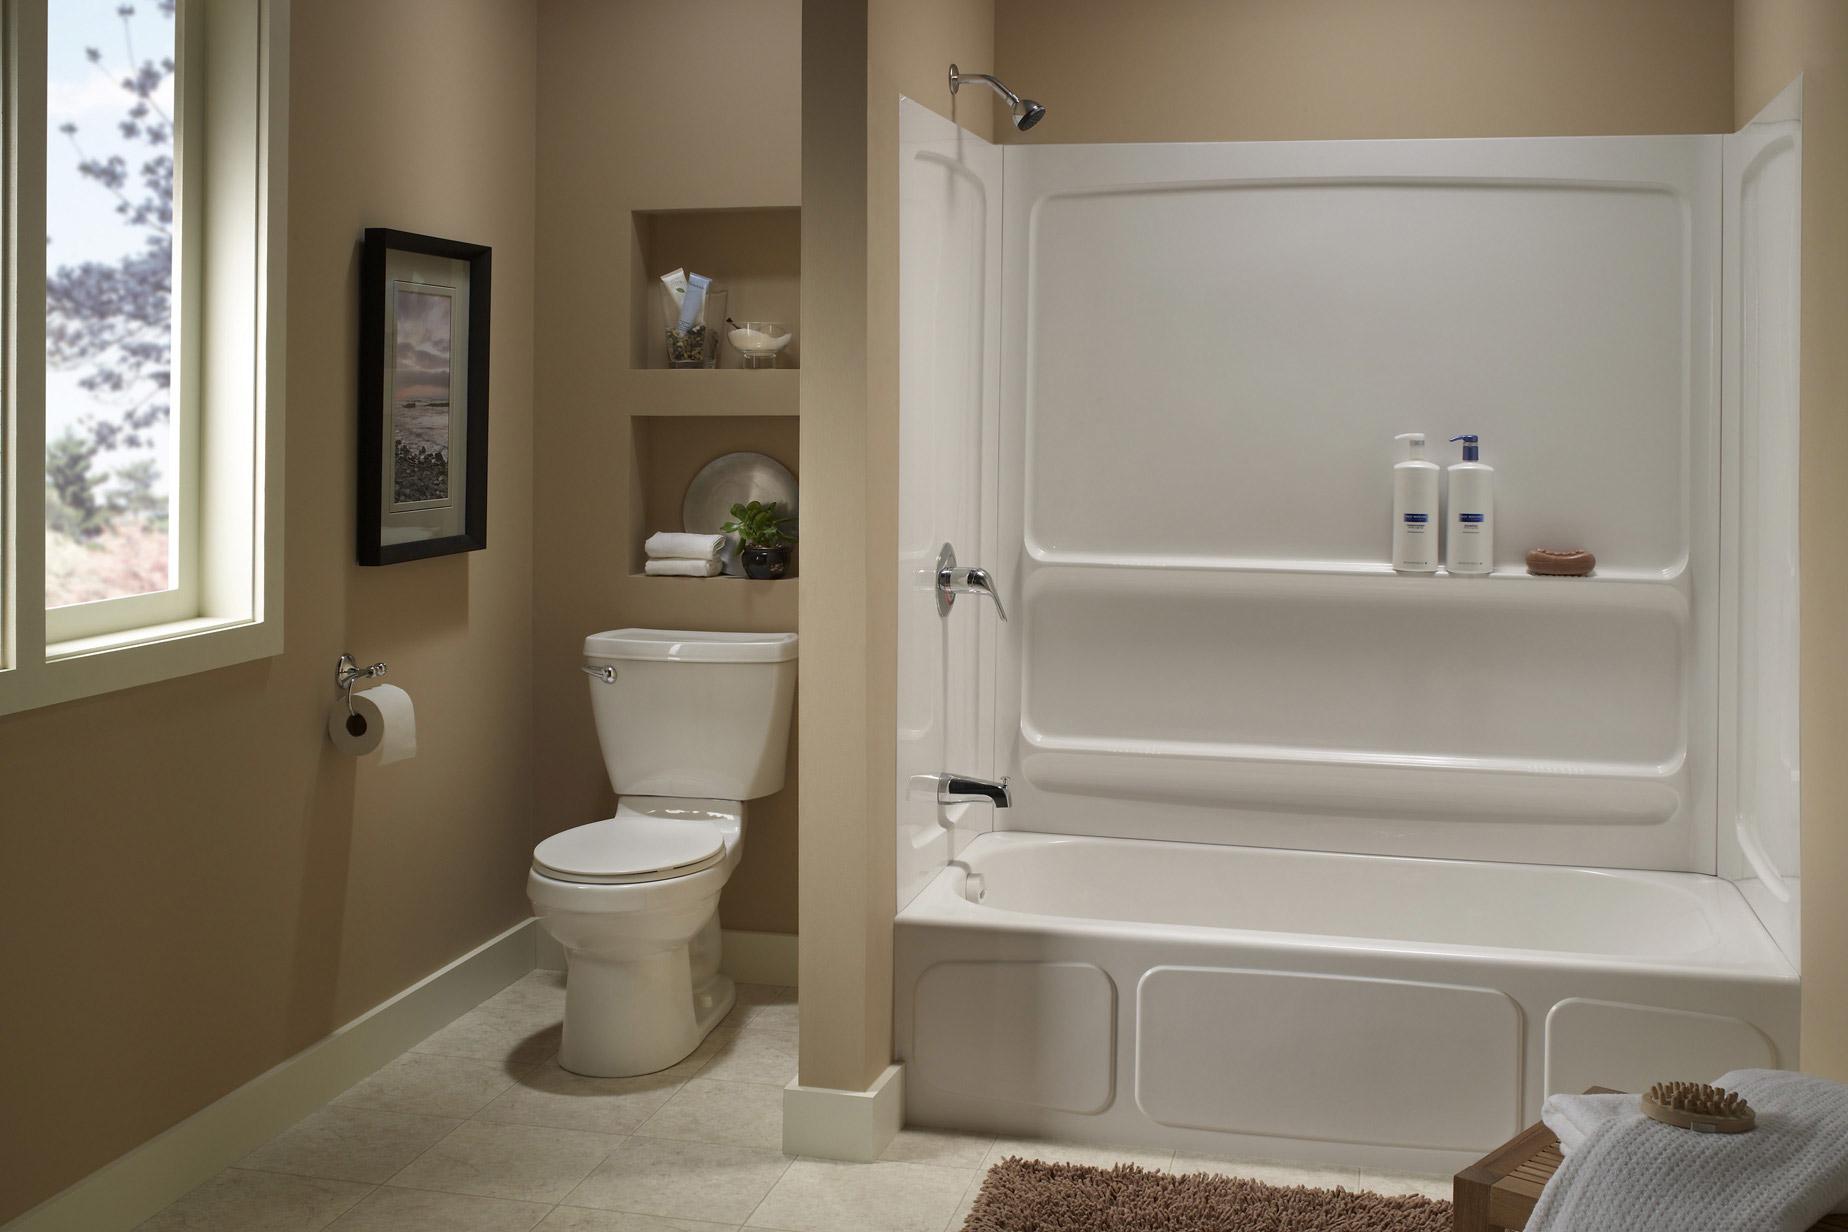 Lennon Plumbing Ltd à Simcoe: Bathroom Renovation